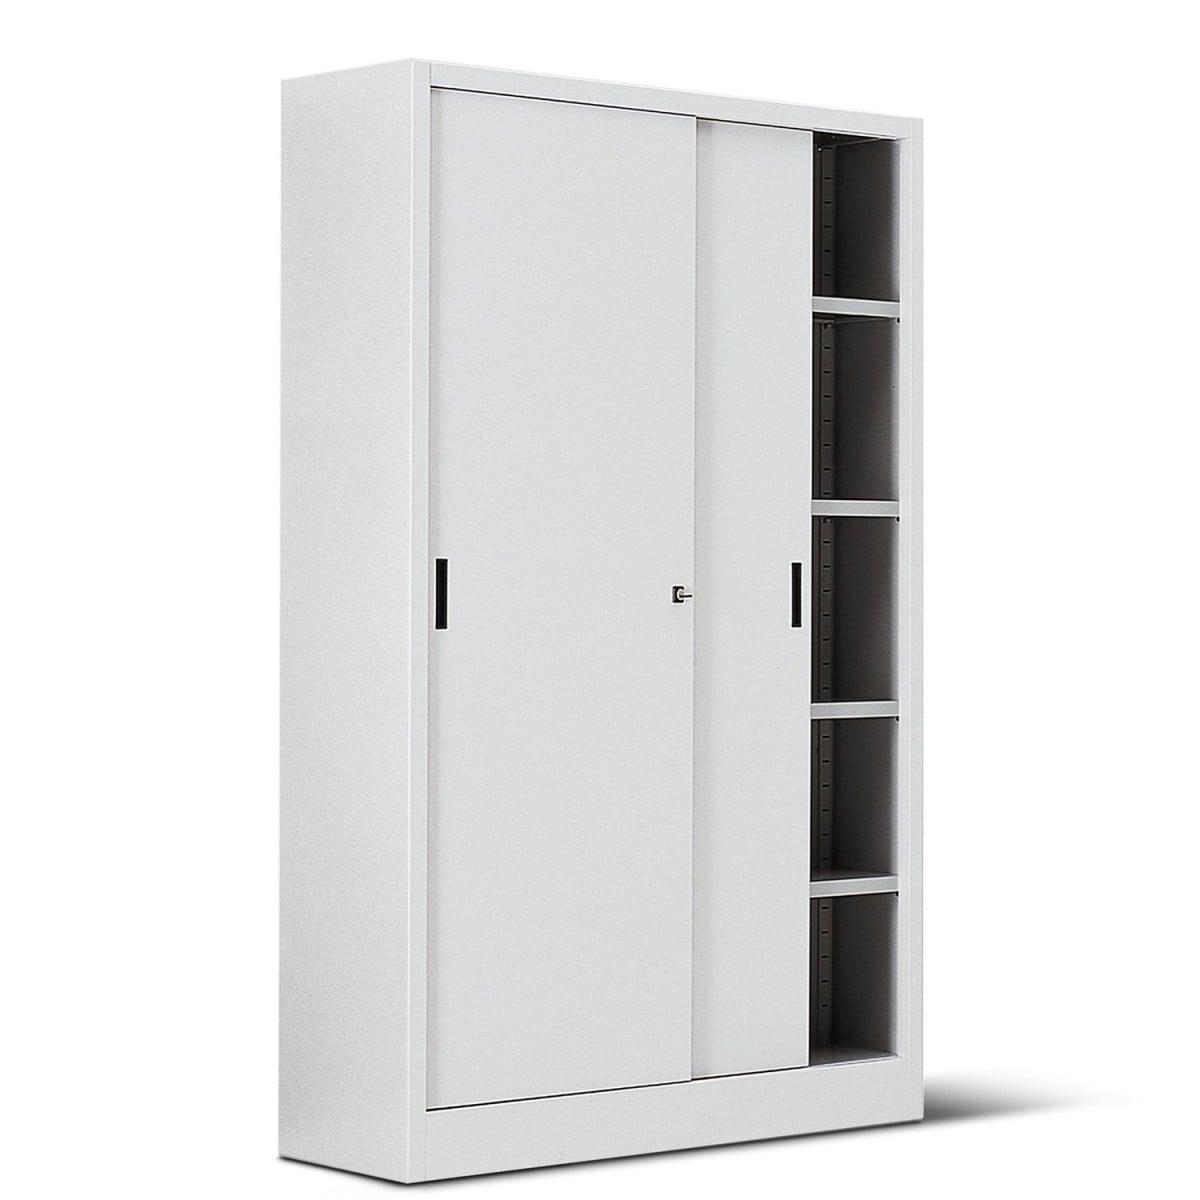 Armadio metallico bianco 120 x 45 x 200 h casa ufficio for Armadio metallico ante scorrevoli 120x45x200